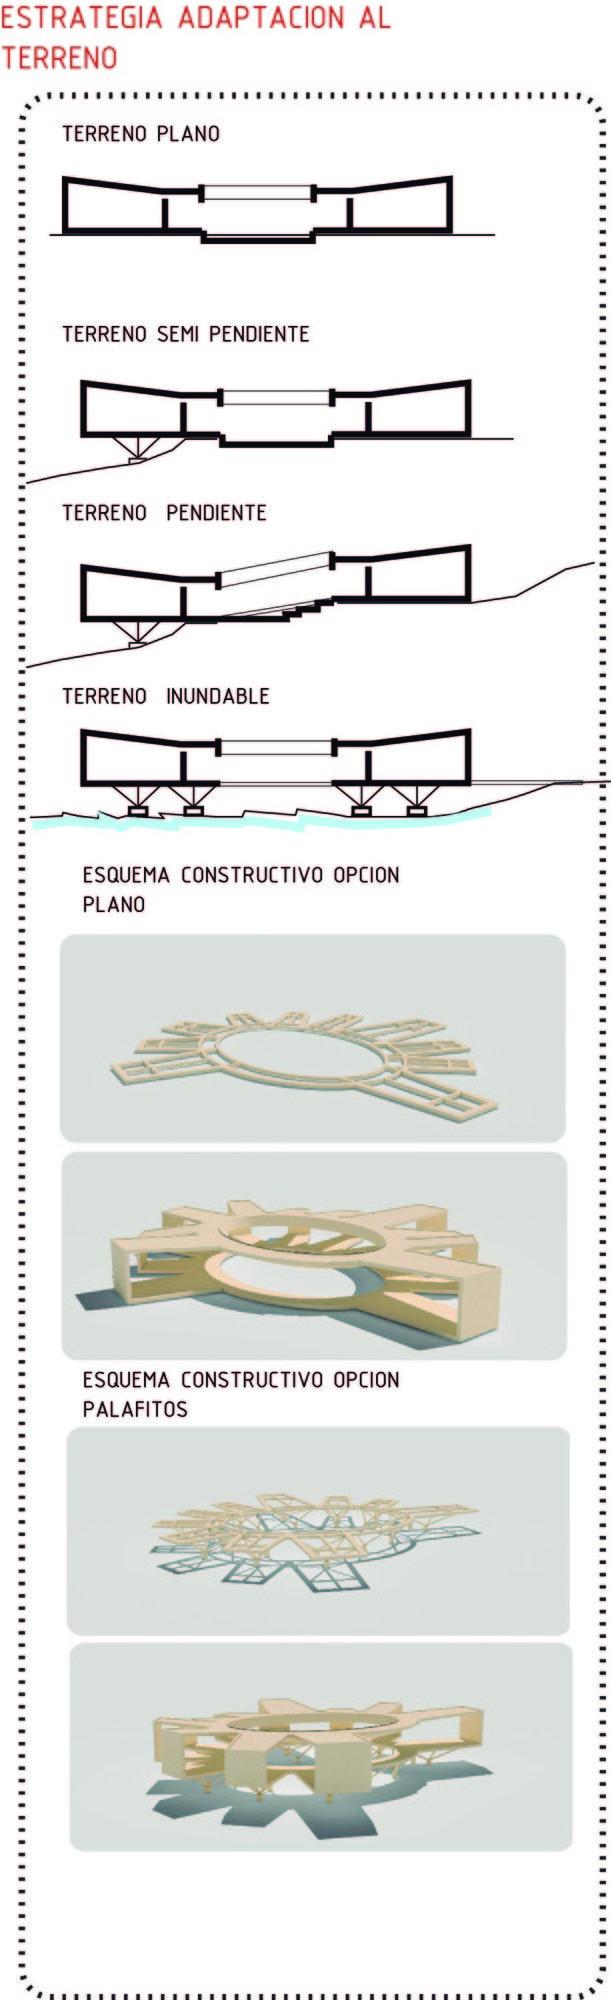 Galeria - Primeiro Lugar no Concurso Protótipo de Escola de Música / Espacio Colectivo Arquitectos - 16